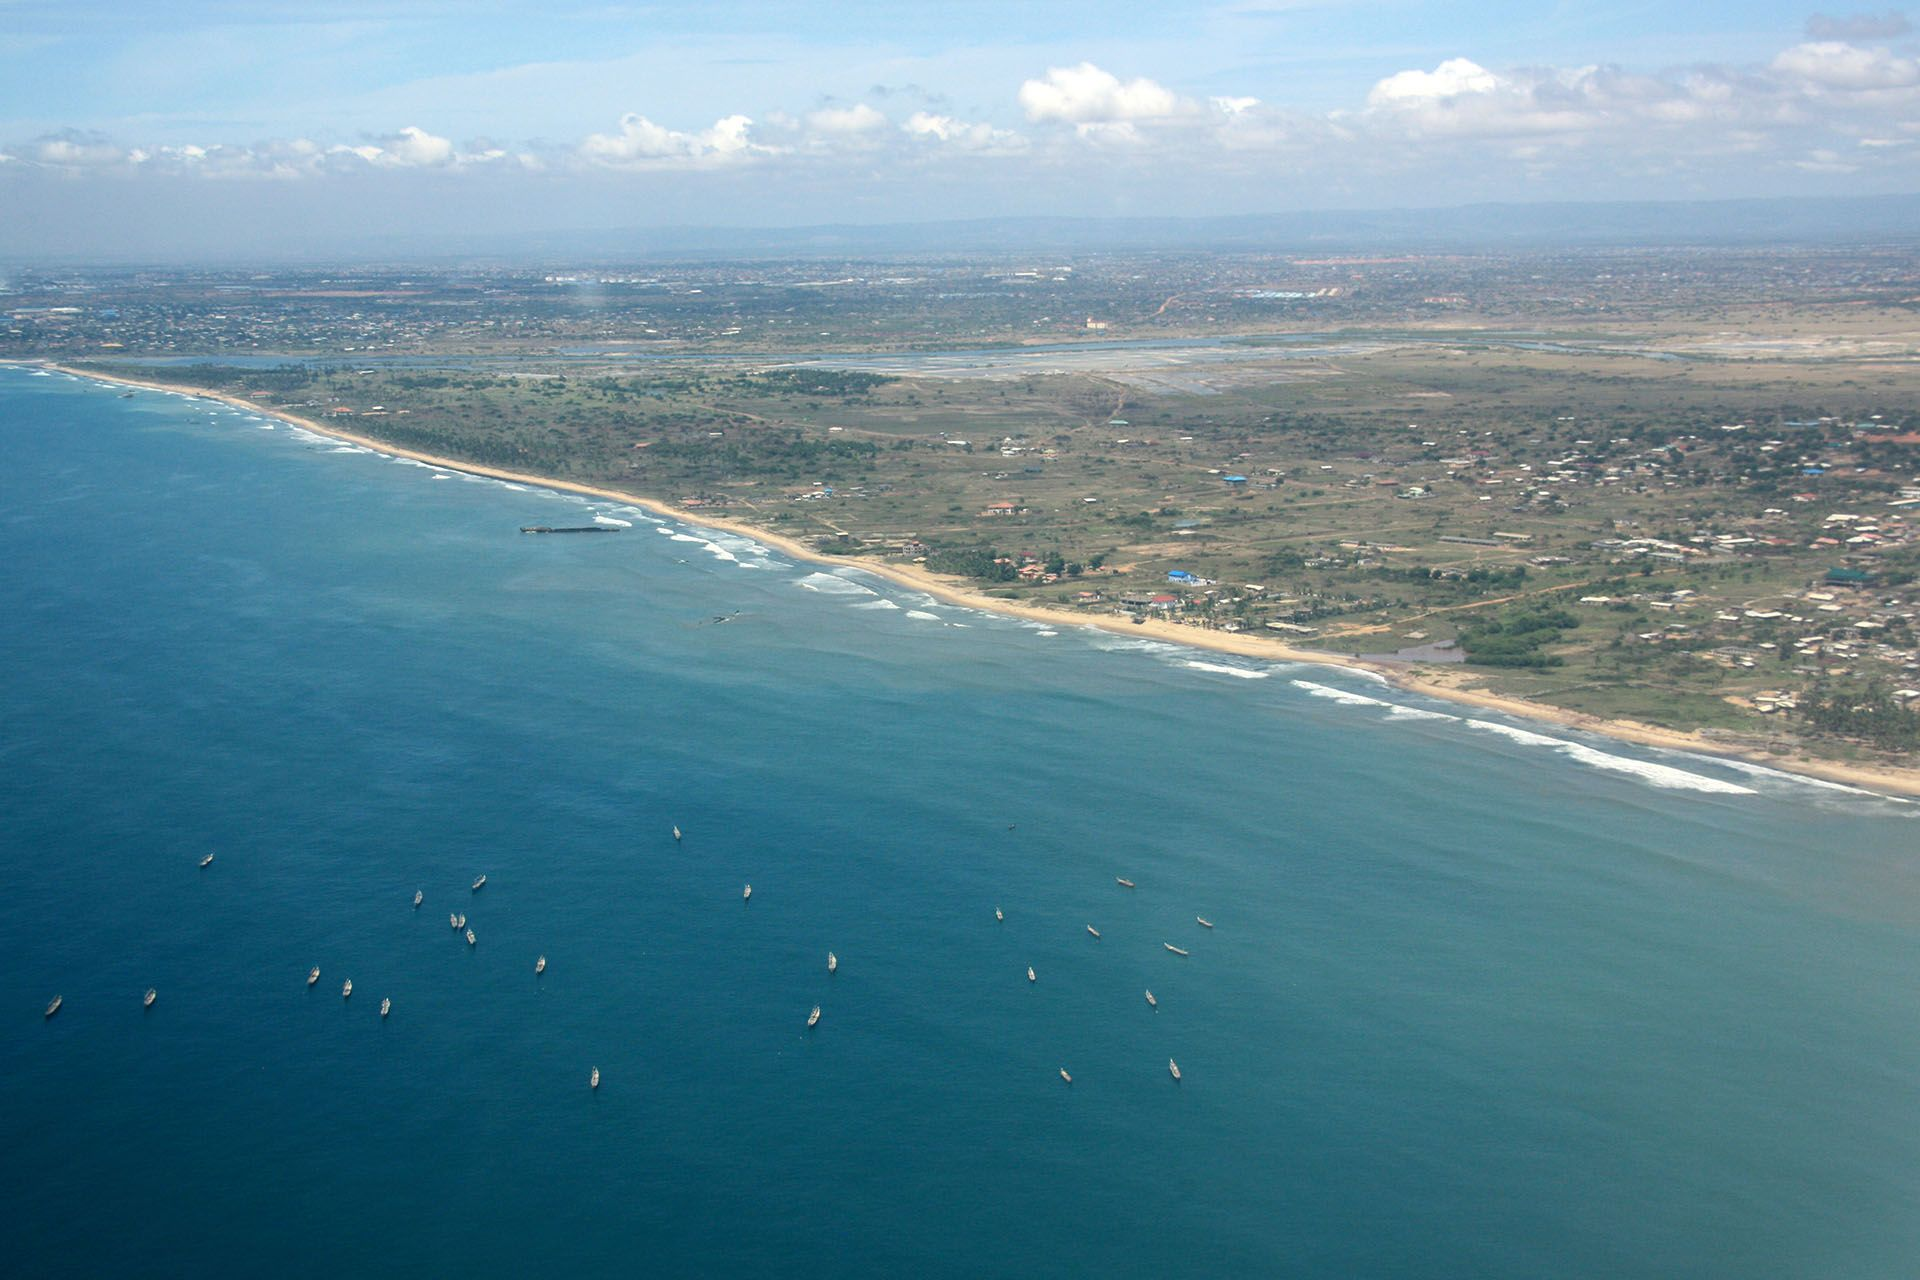 Ghana, base navale in mare